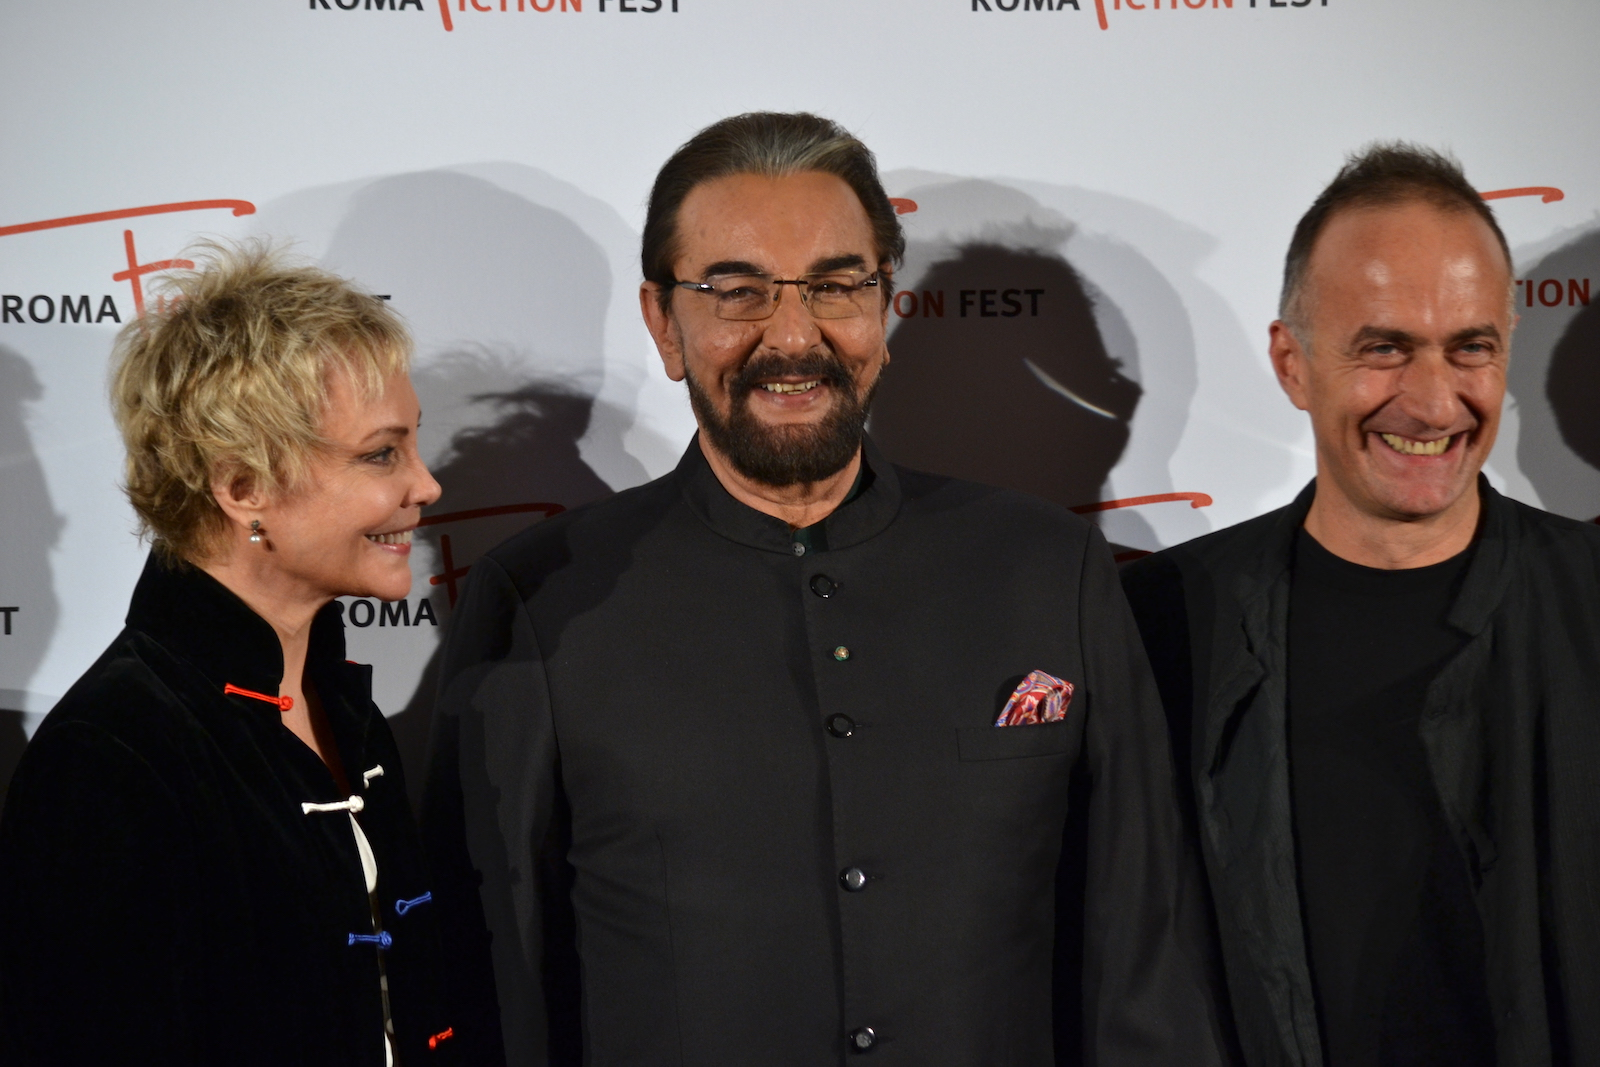 Roma Fiction Fest 2015: Kabie Bedi, Carole André e Stefano Sollima sul red carpet di Sandokan